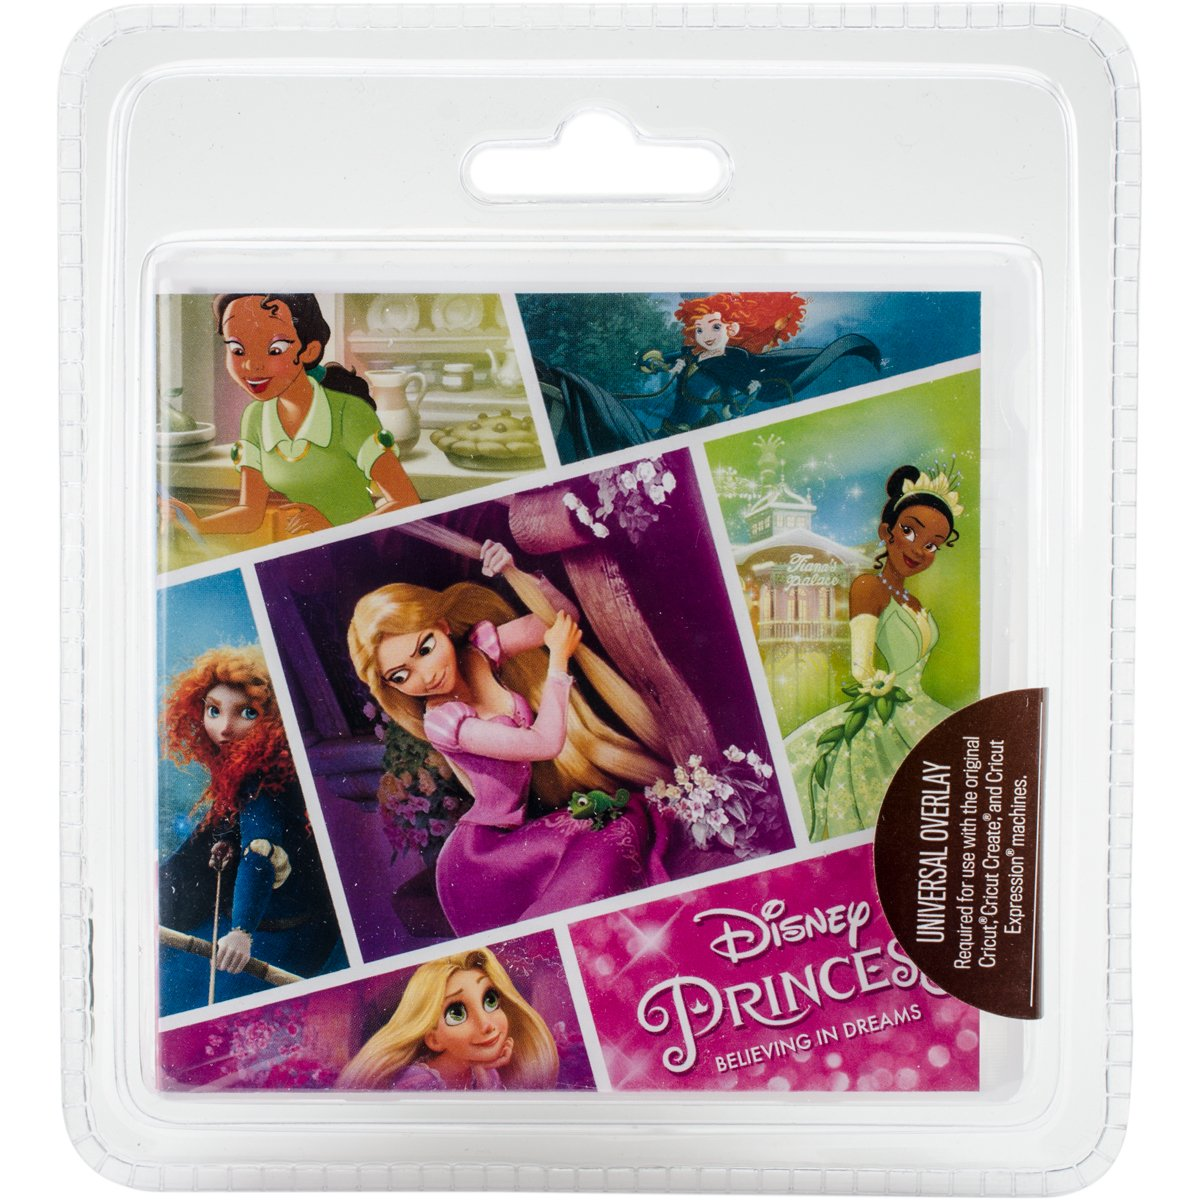 Cricut 2002881 Disney Princess Believing in Dreams Cartridges